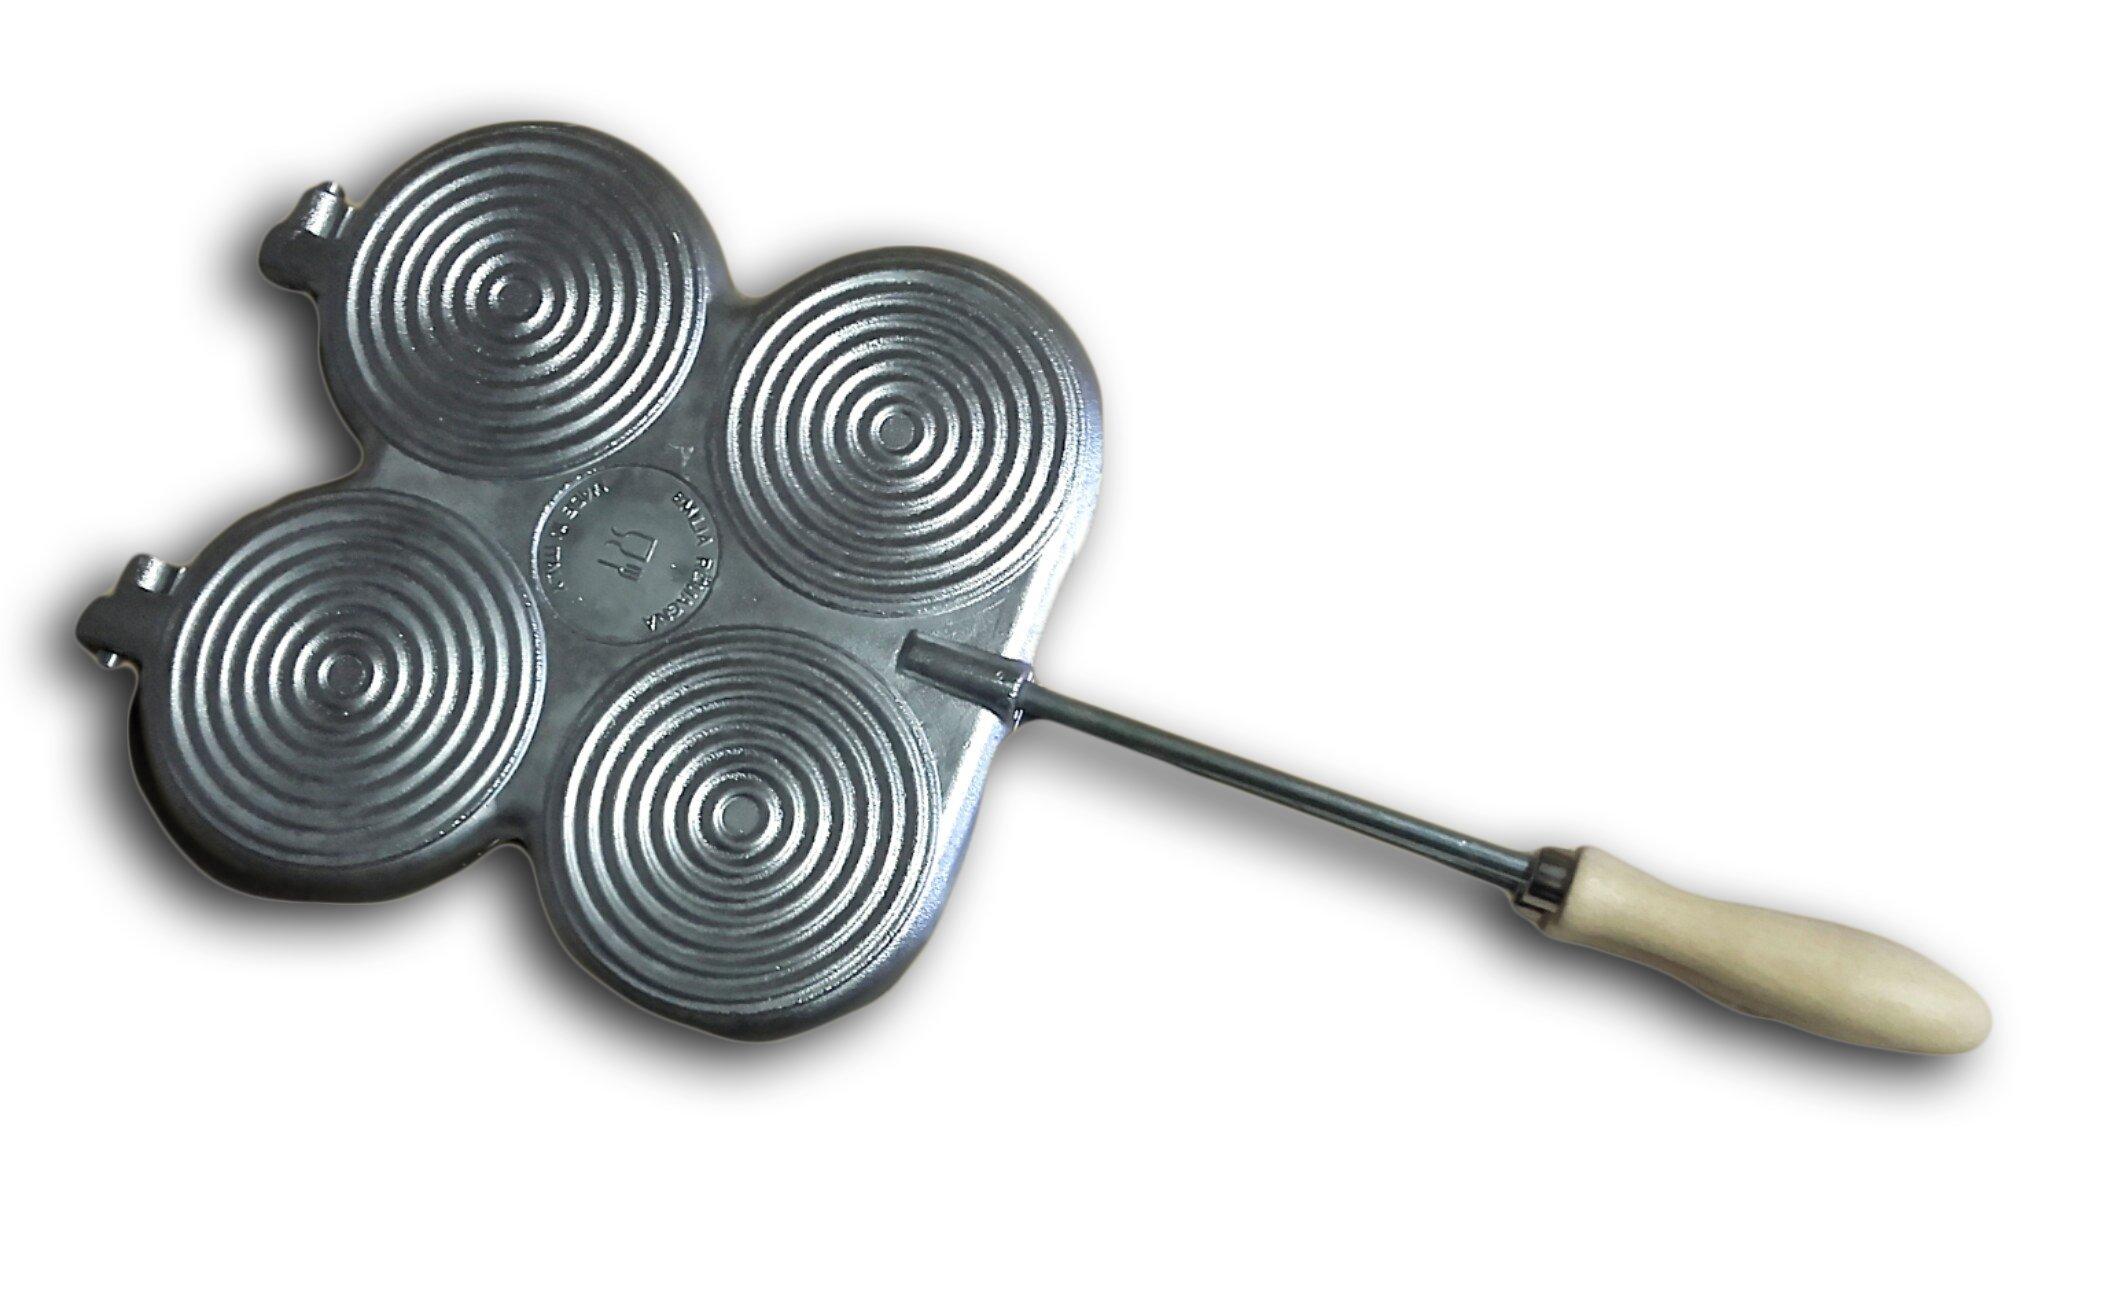 ELETTRO CENTER Art. 378GME-Frying Pan, Aluminium, Silver by ELETTRO CENTER